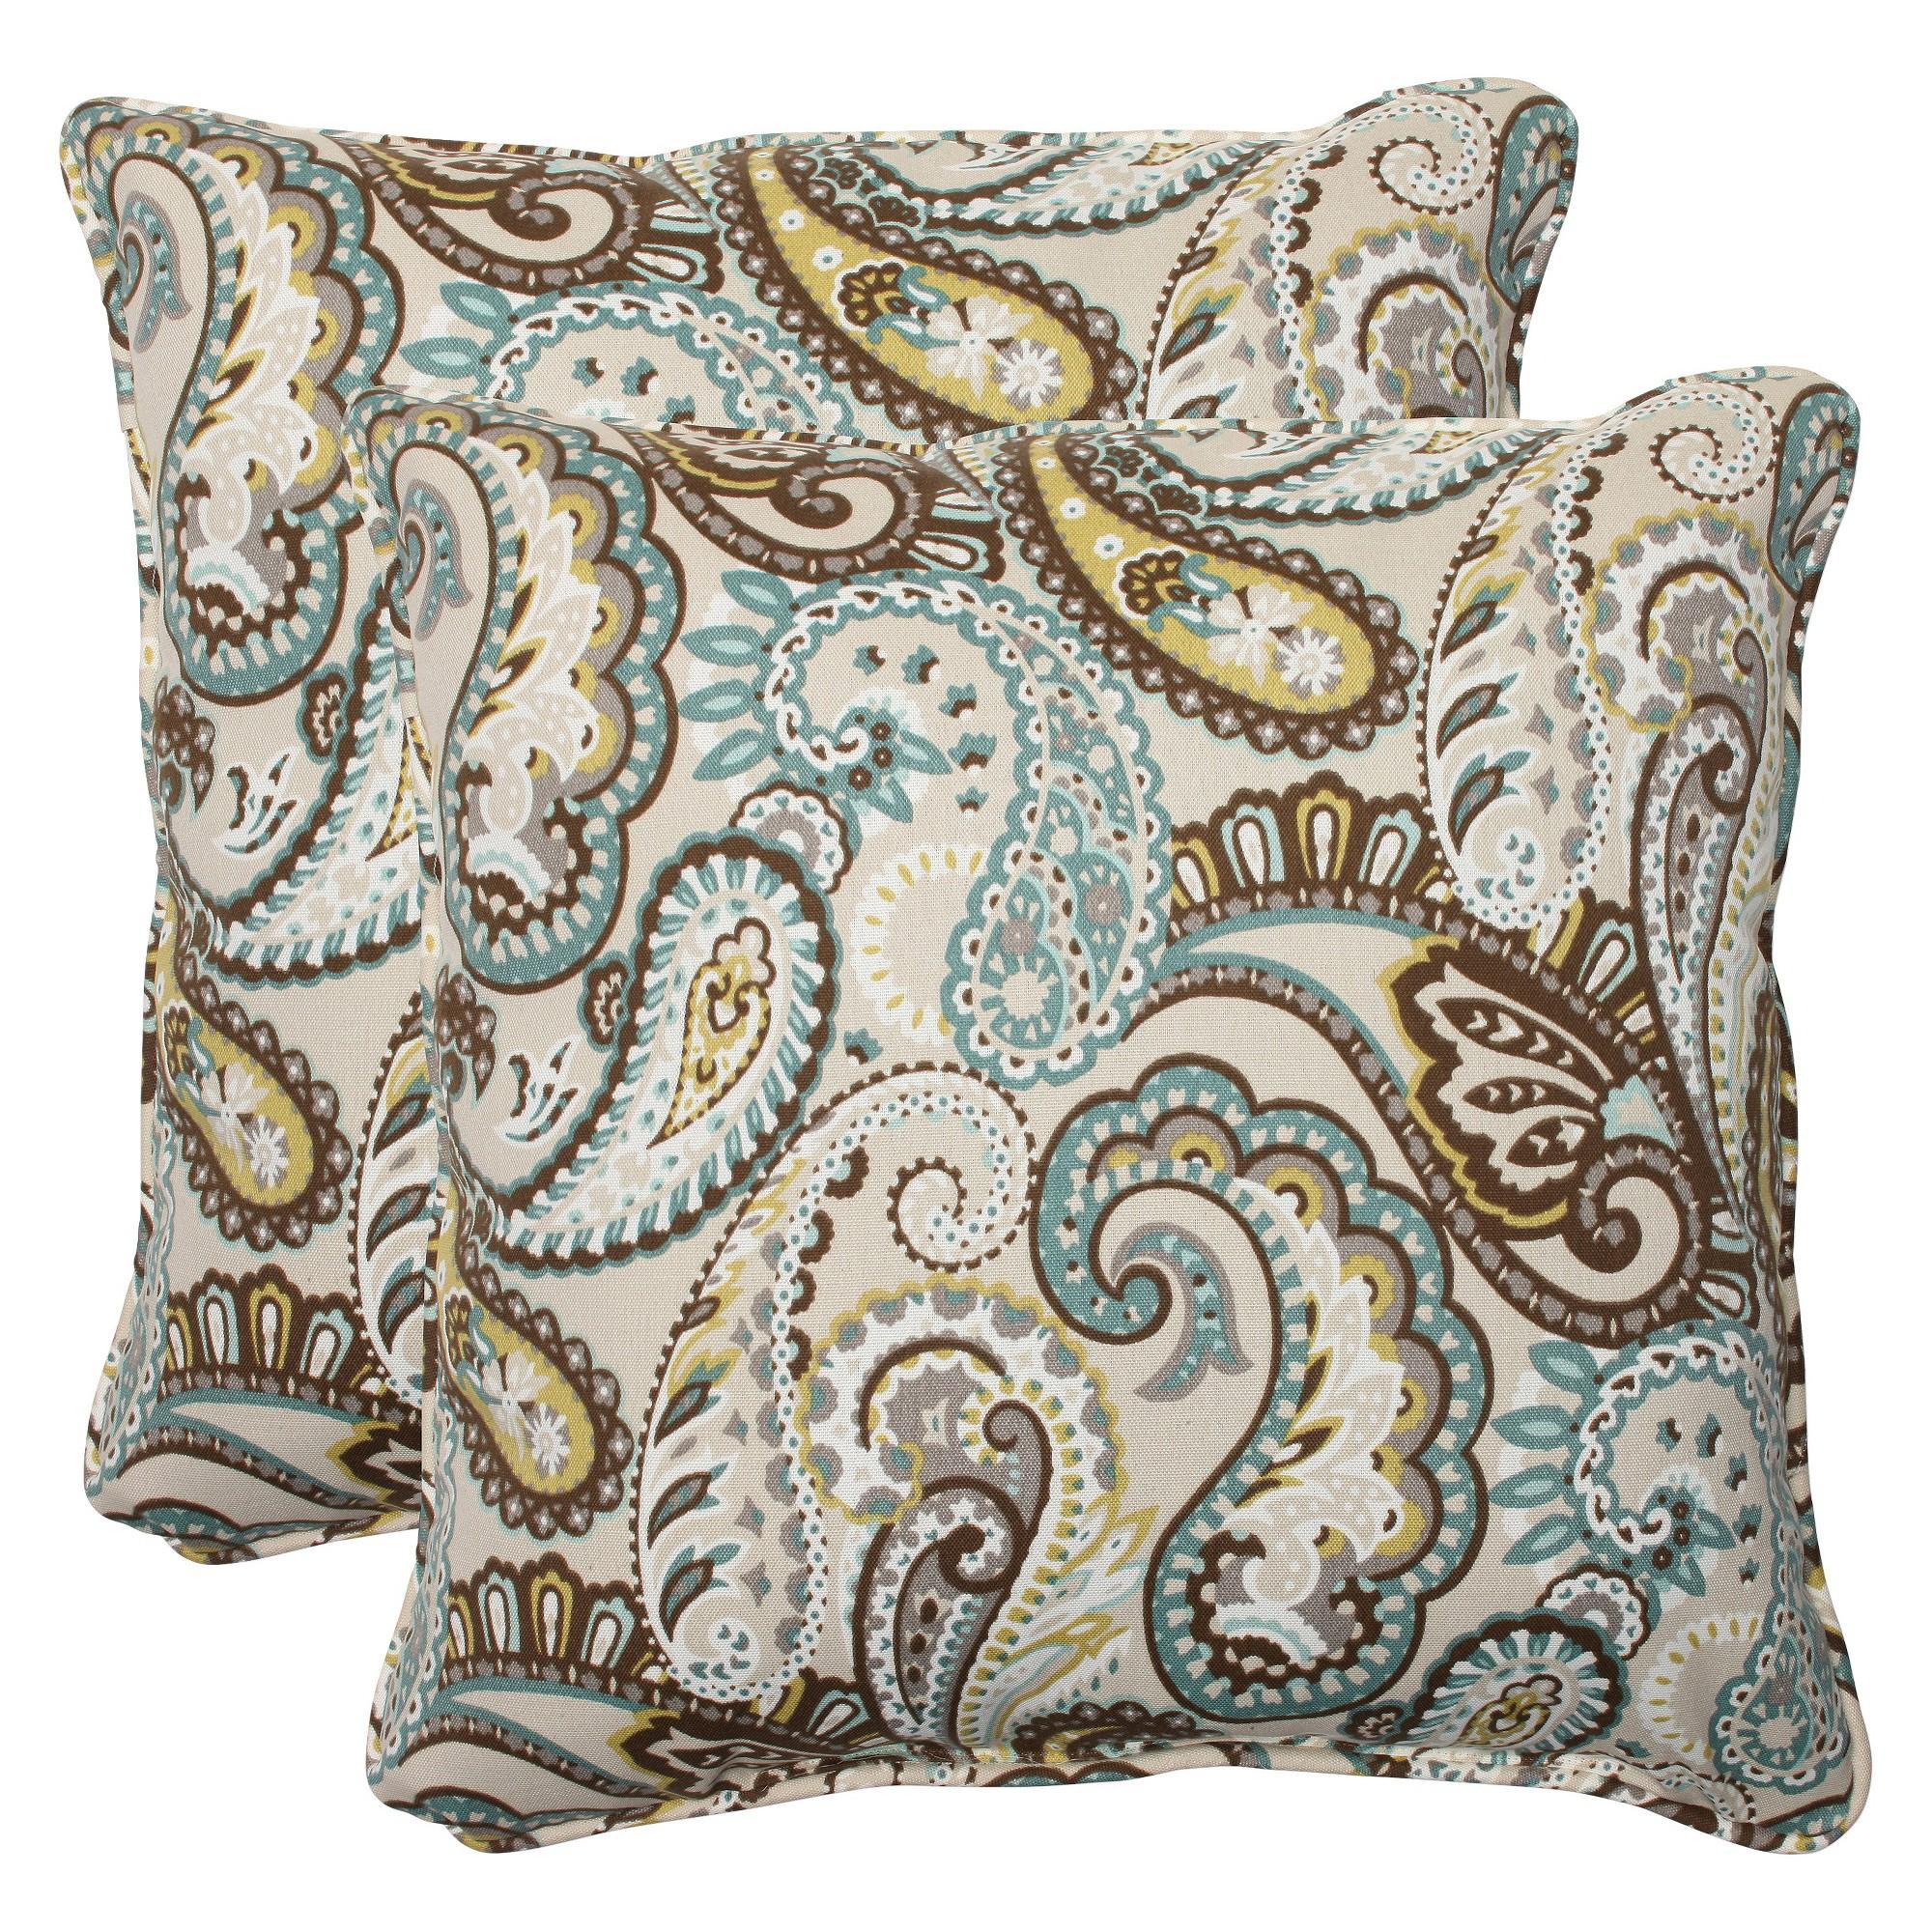 2 Pc Outdoor Square Throw Pillows - Tamara Paisley - Pillow Perfect